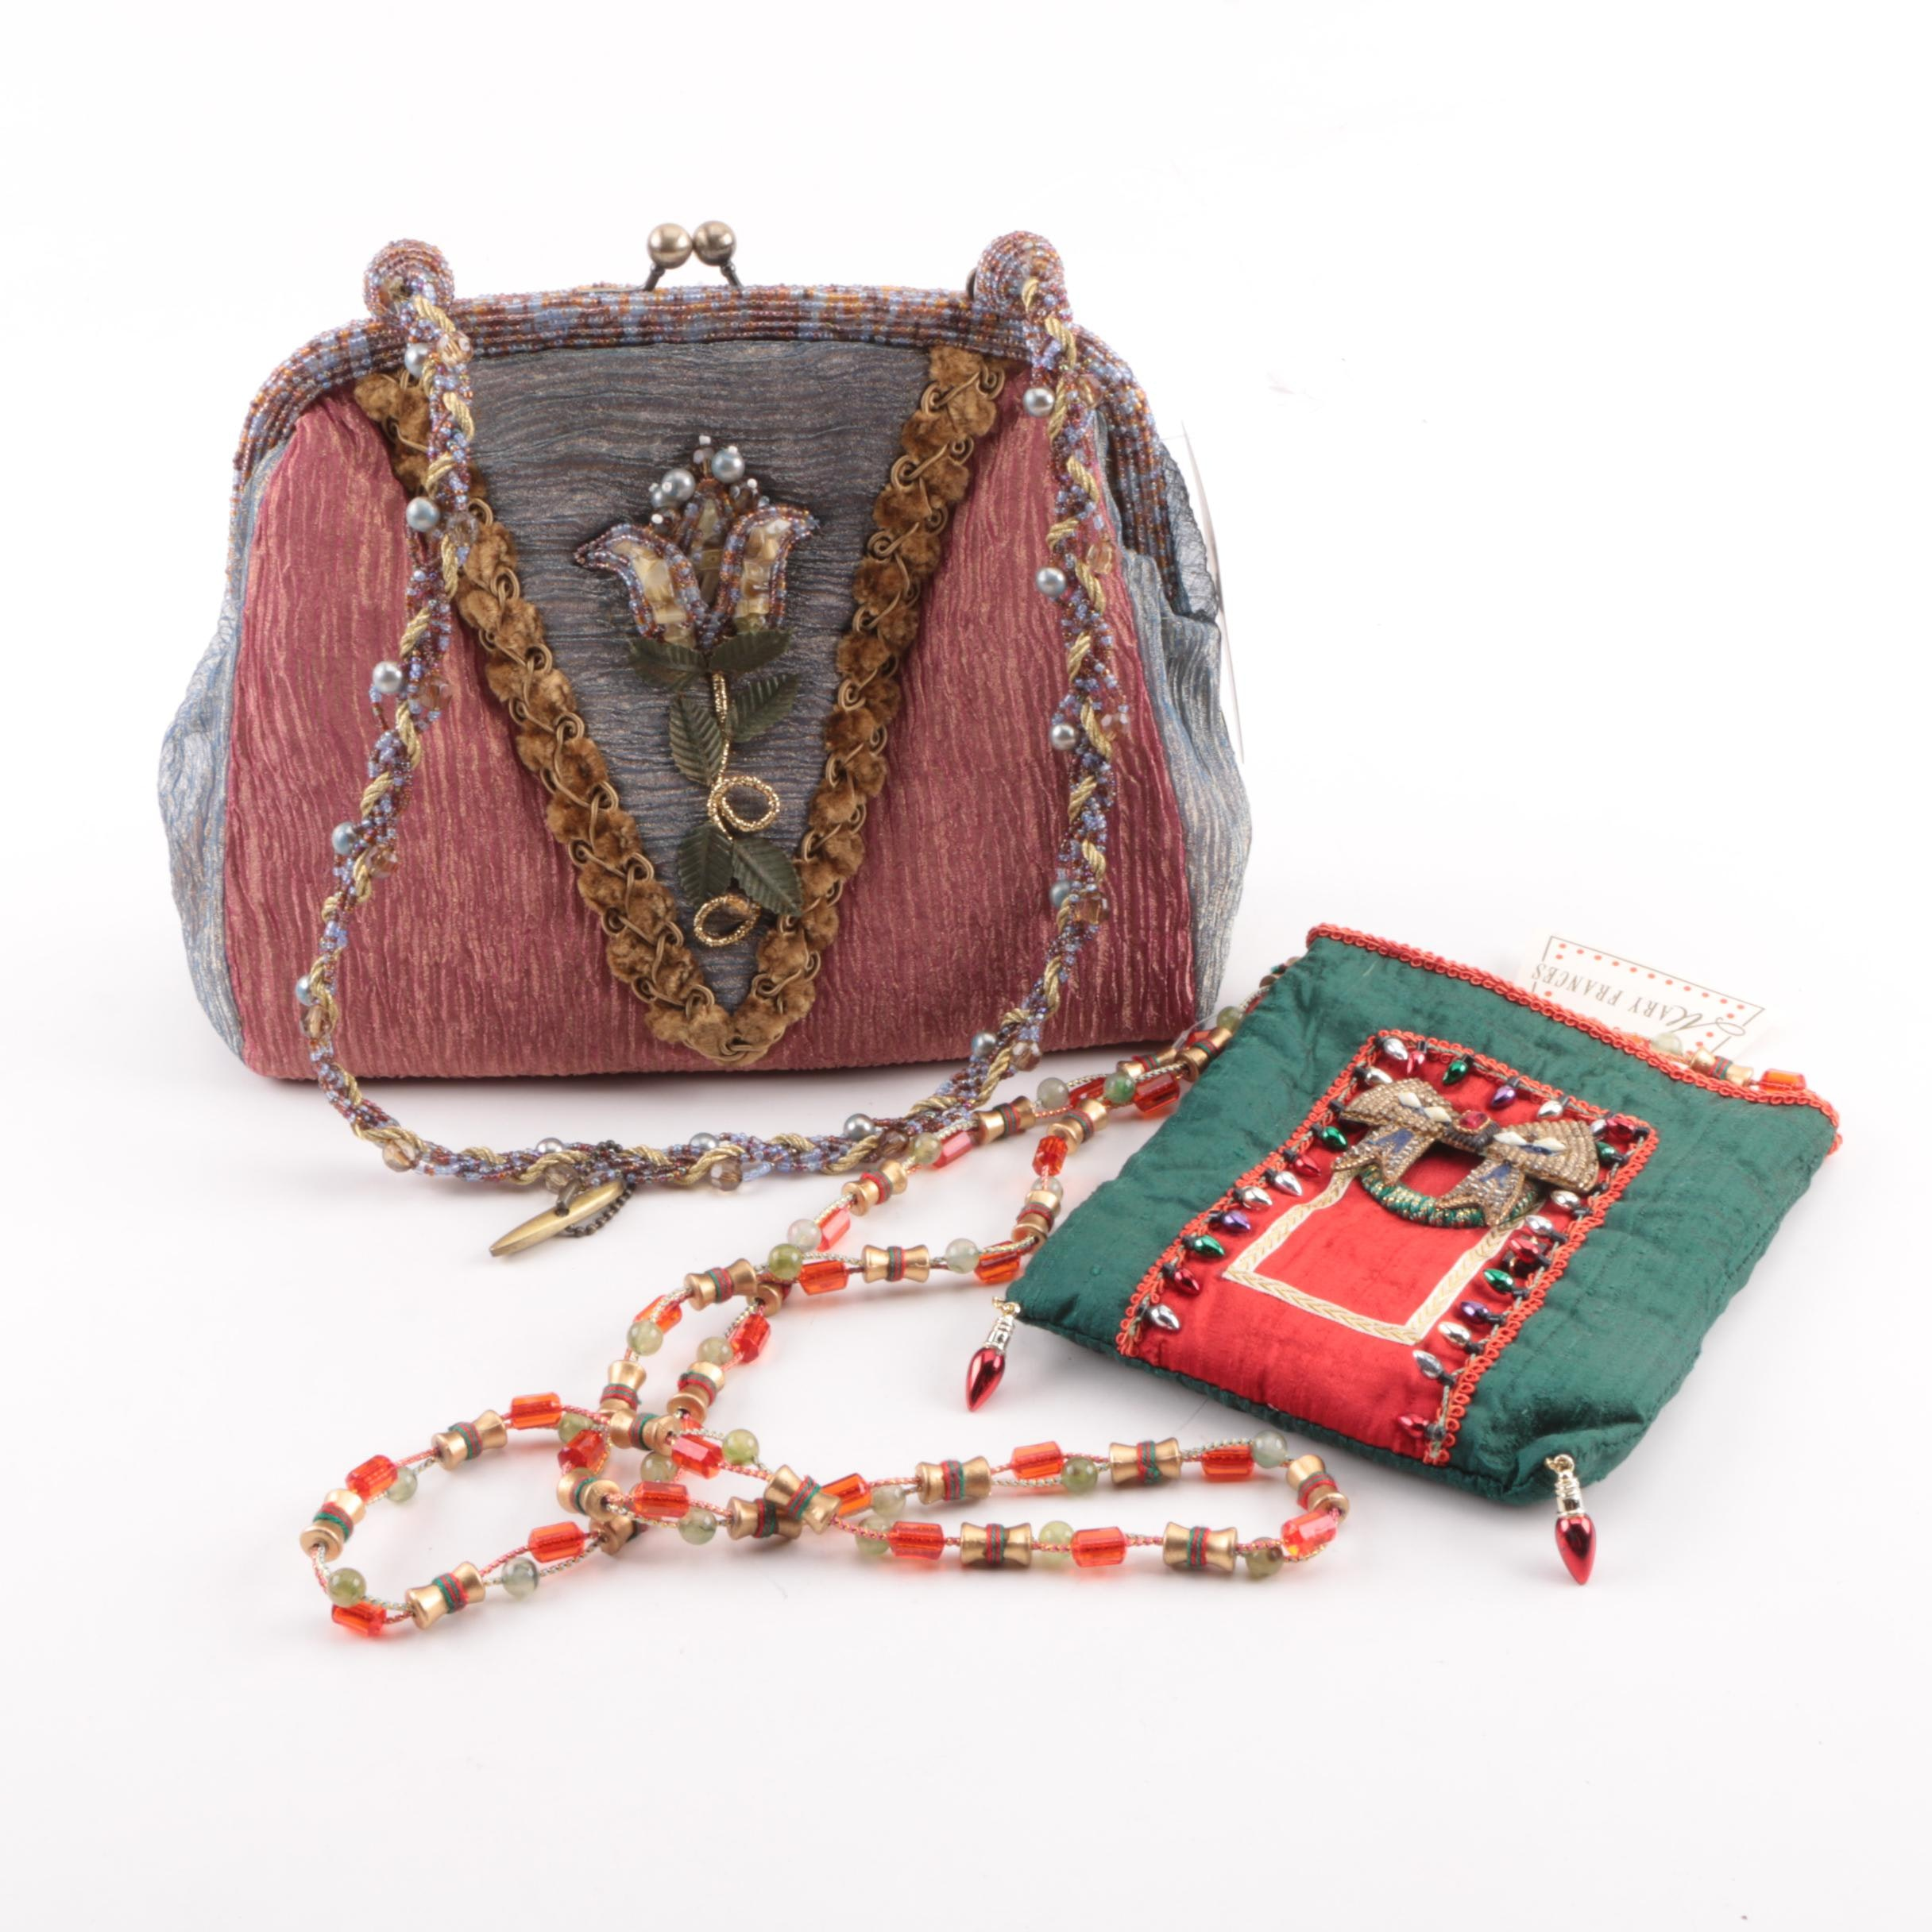 Mary Frances of San Francisco Embellished Handbags